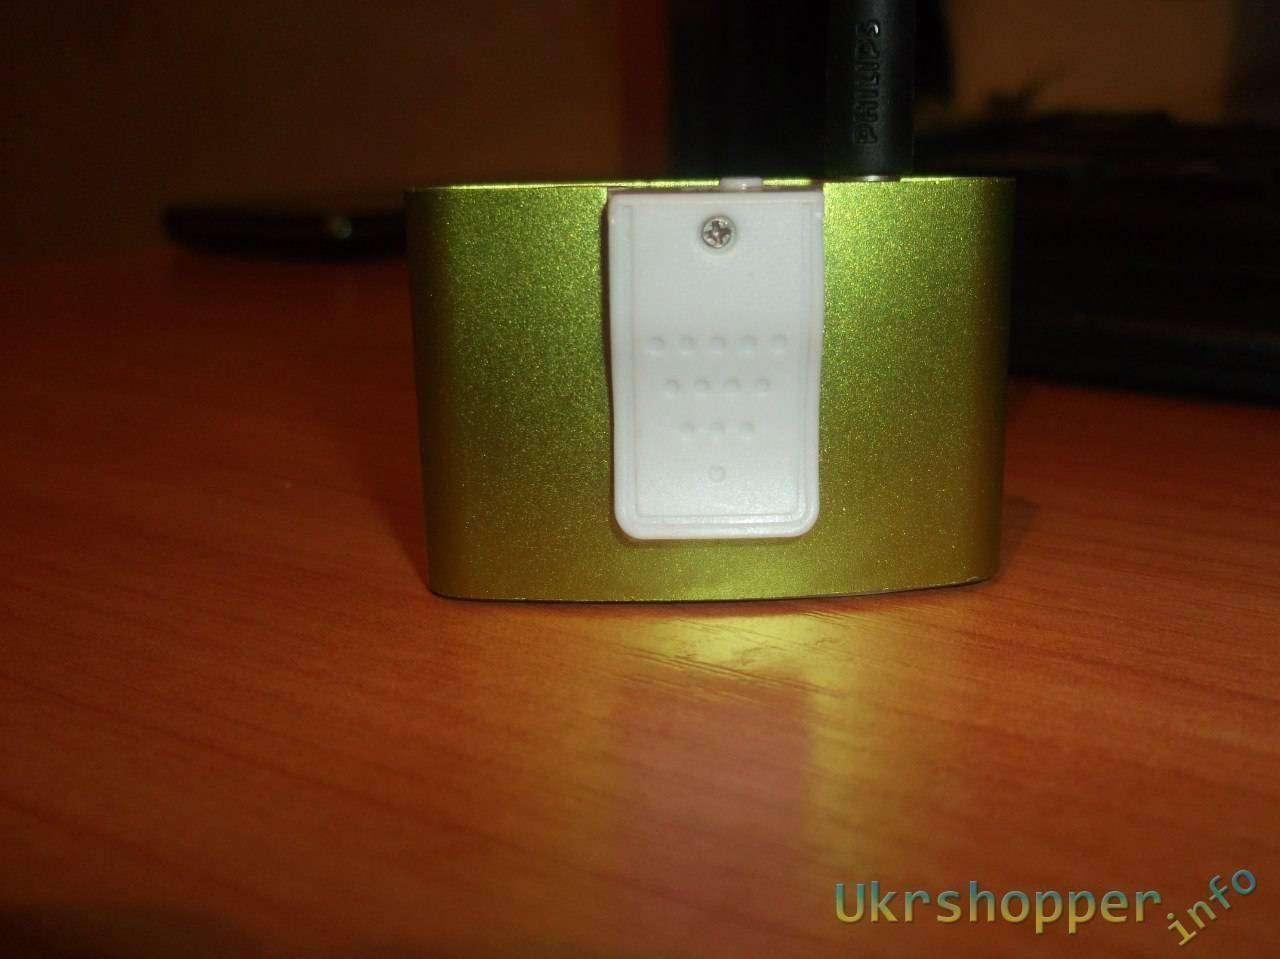 TinyDeal: MP3 плеер который удивил или плеер за 70 рублей.